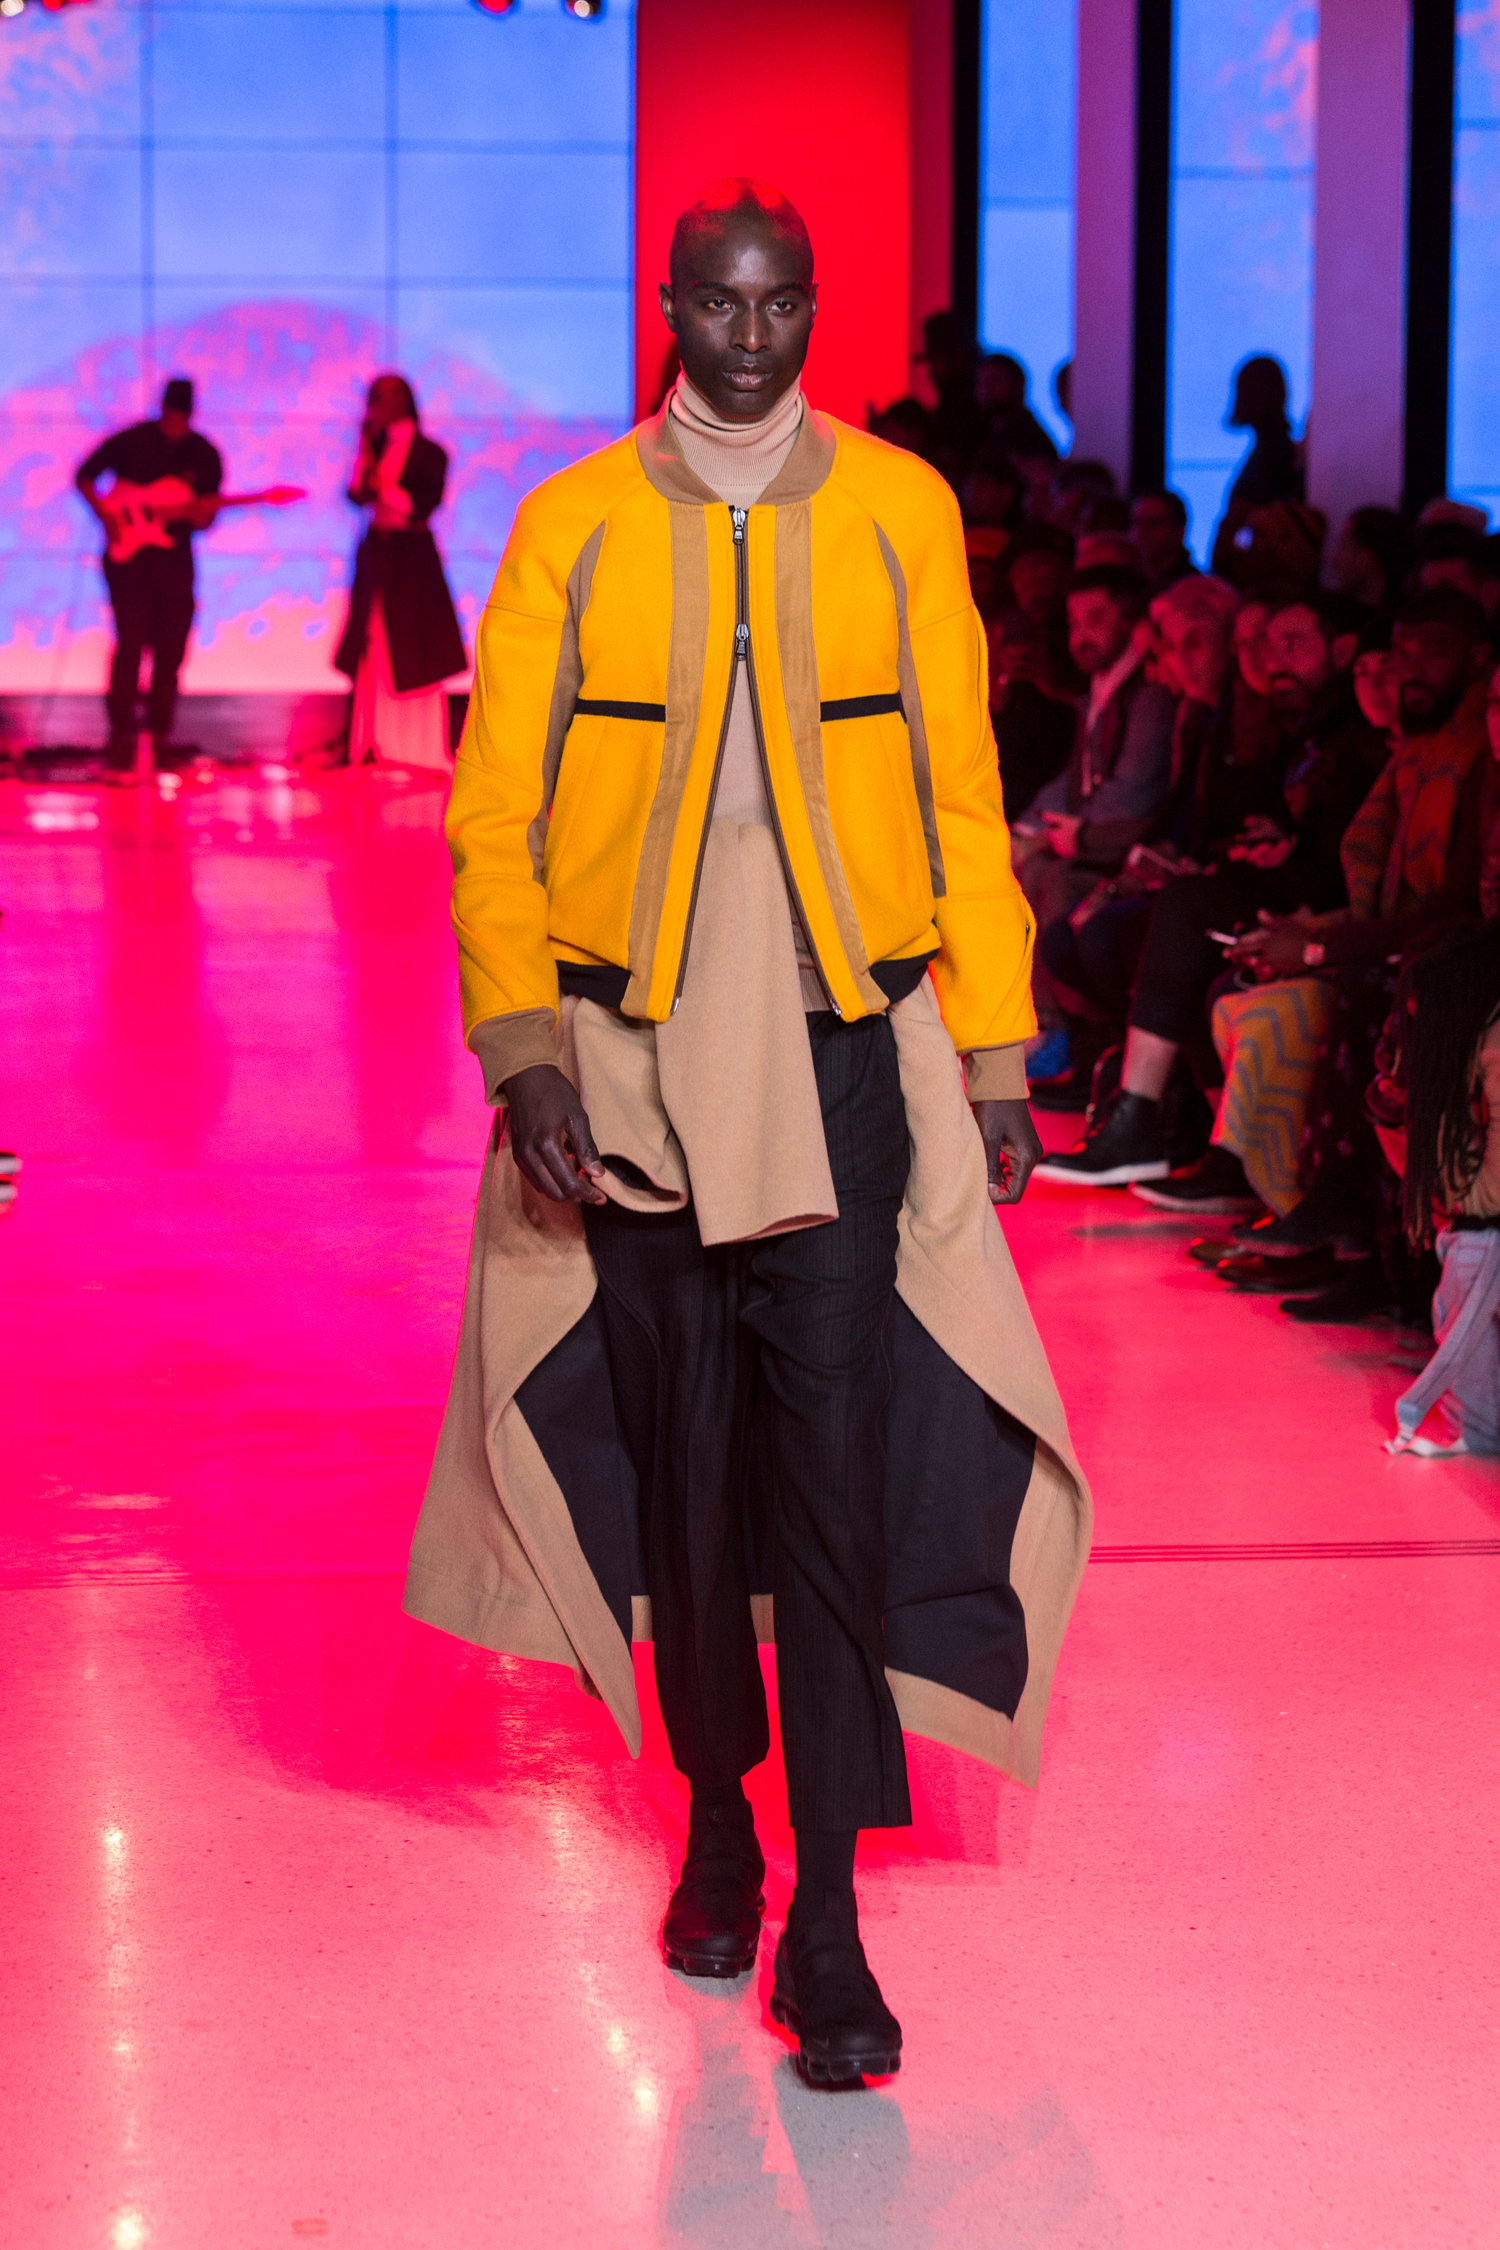 LOOK 29   ARC Flight Jacket  / Rover Yellow   ARC Orison Coat  (Worn On Waist) / Camel   ARC Turtleneck  / Camel   ARC Ankara Pant  / Black Wool   Nike Air VaporMax Utility